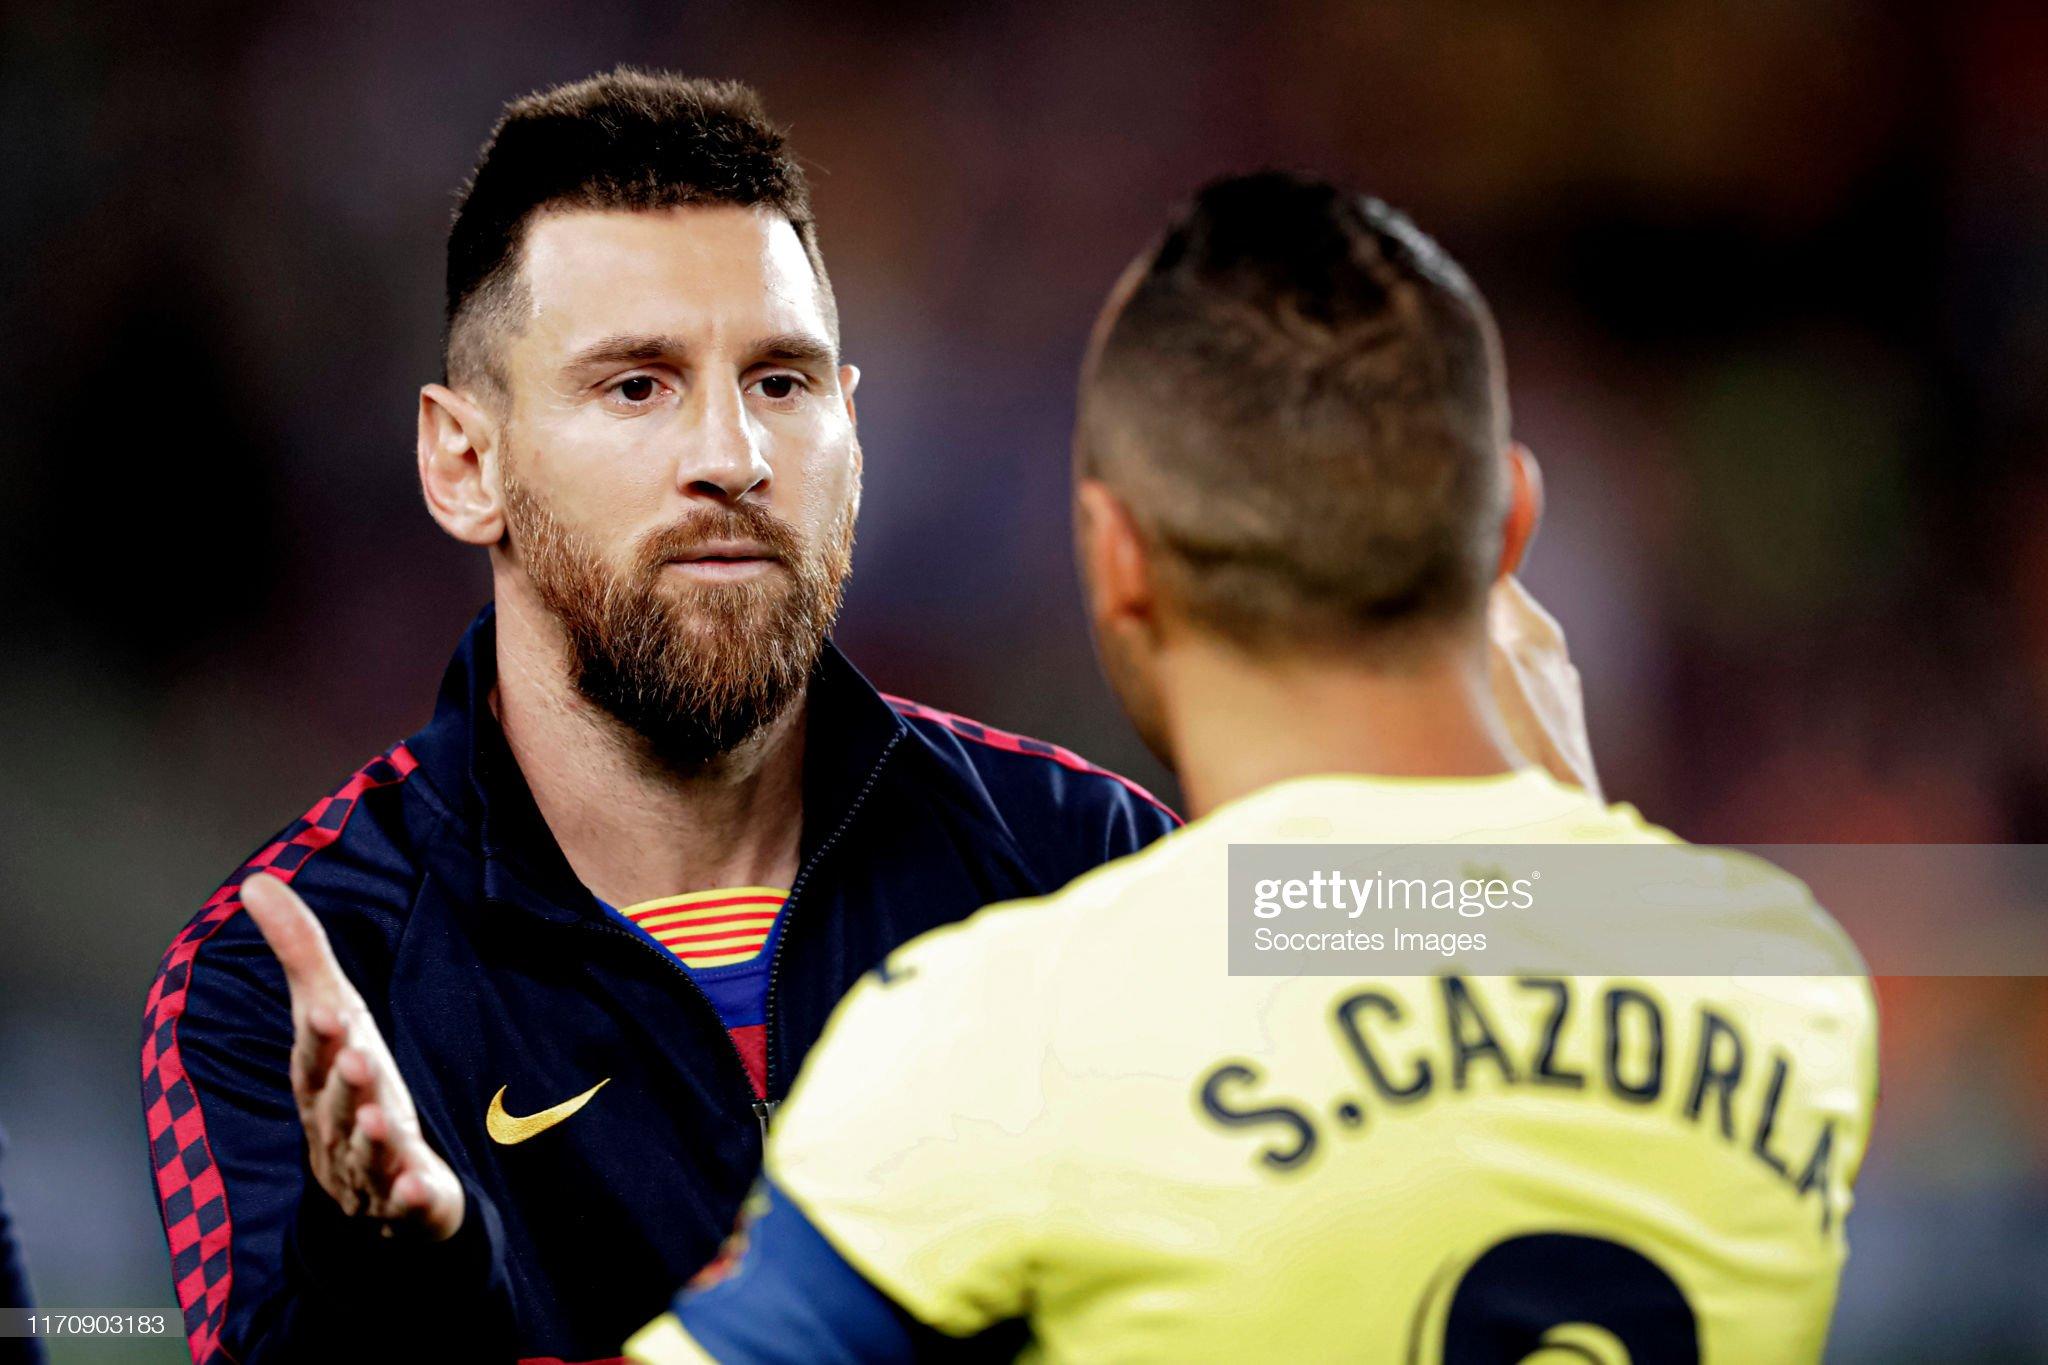 صور مباراة : برشلونة - فياريال 2-1 ( 24-09-2019 )  Lionel-messi-of-fc-barcelona-santi-cazorla-of-villarreal-during-the-picture-id1170903183?s=2048x2048